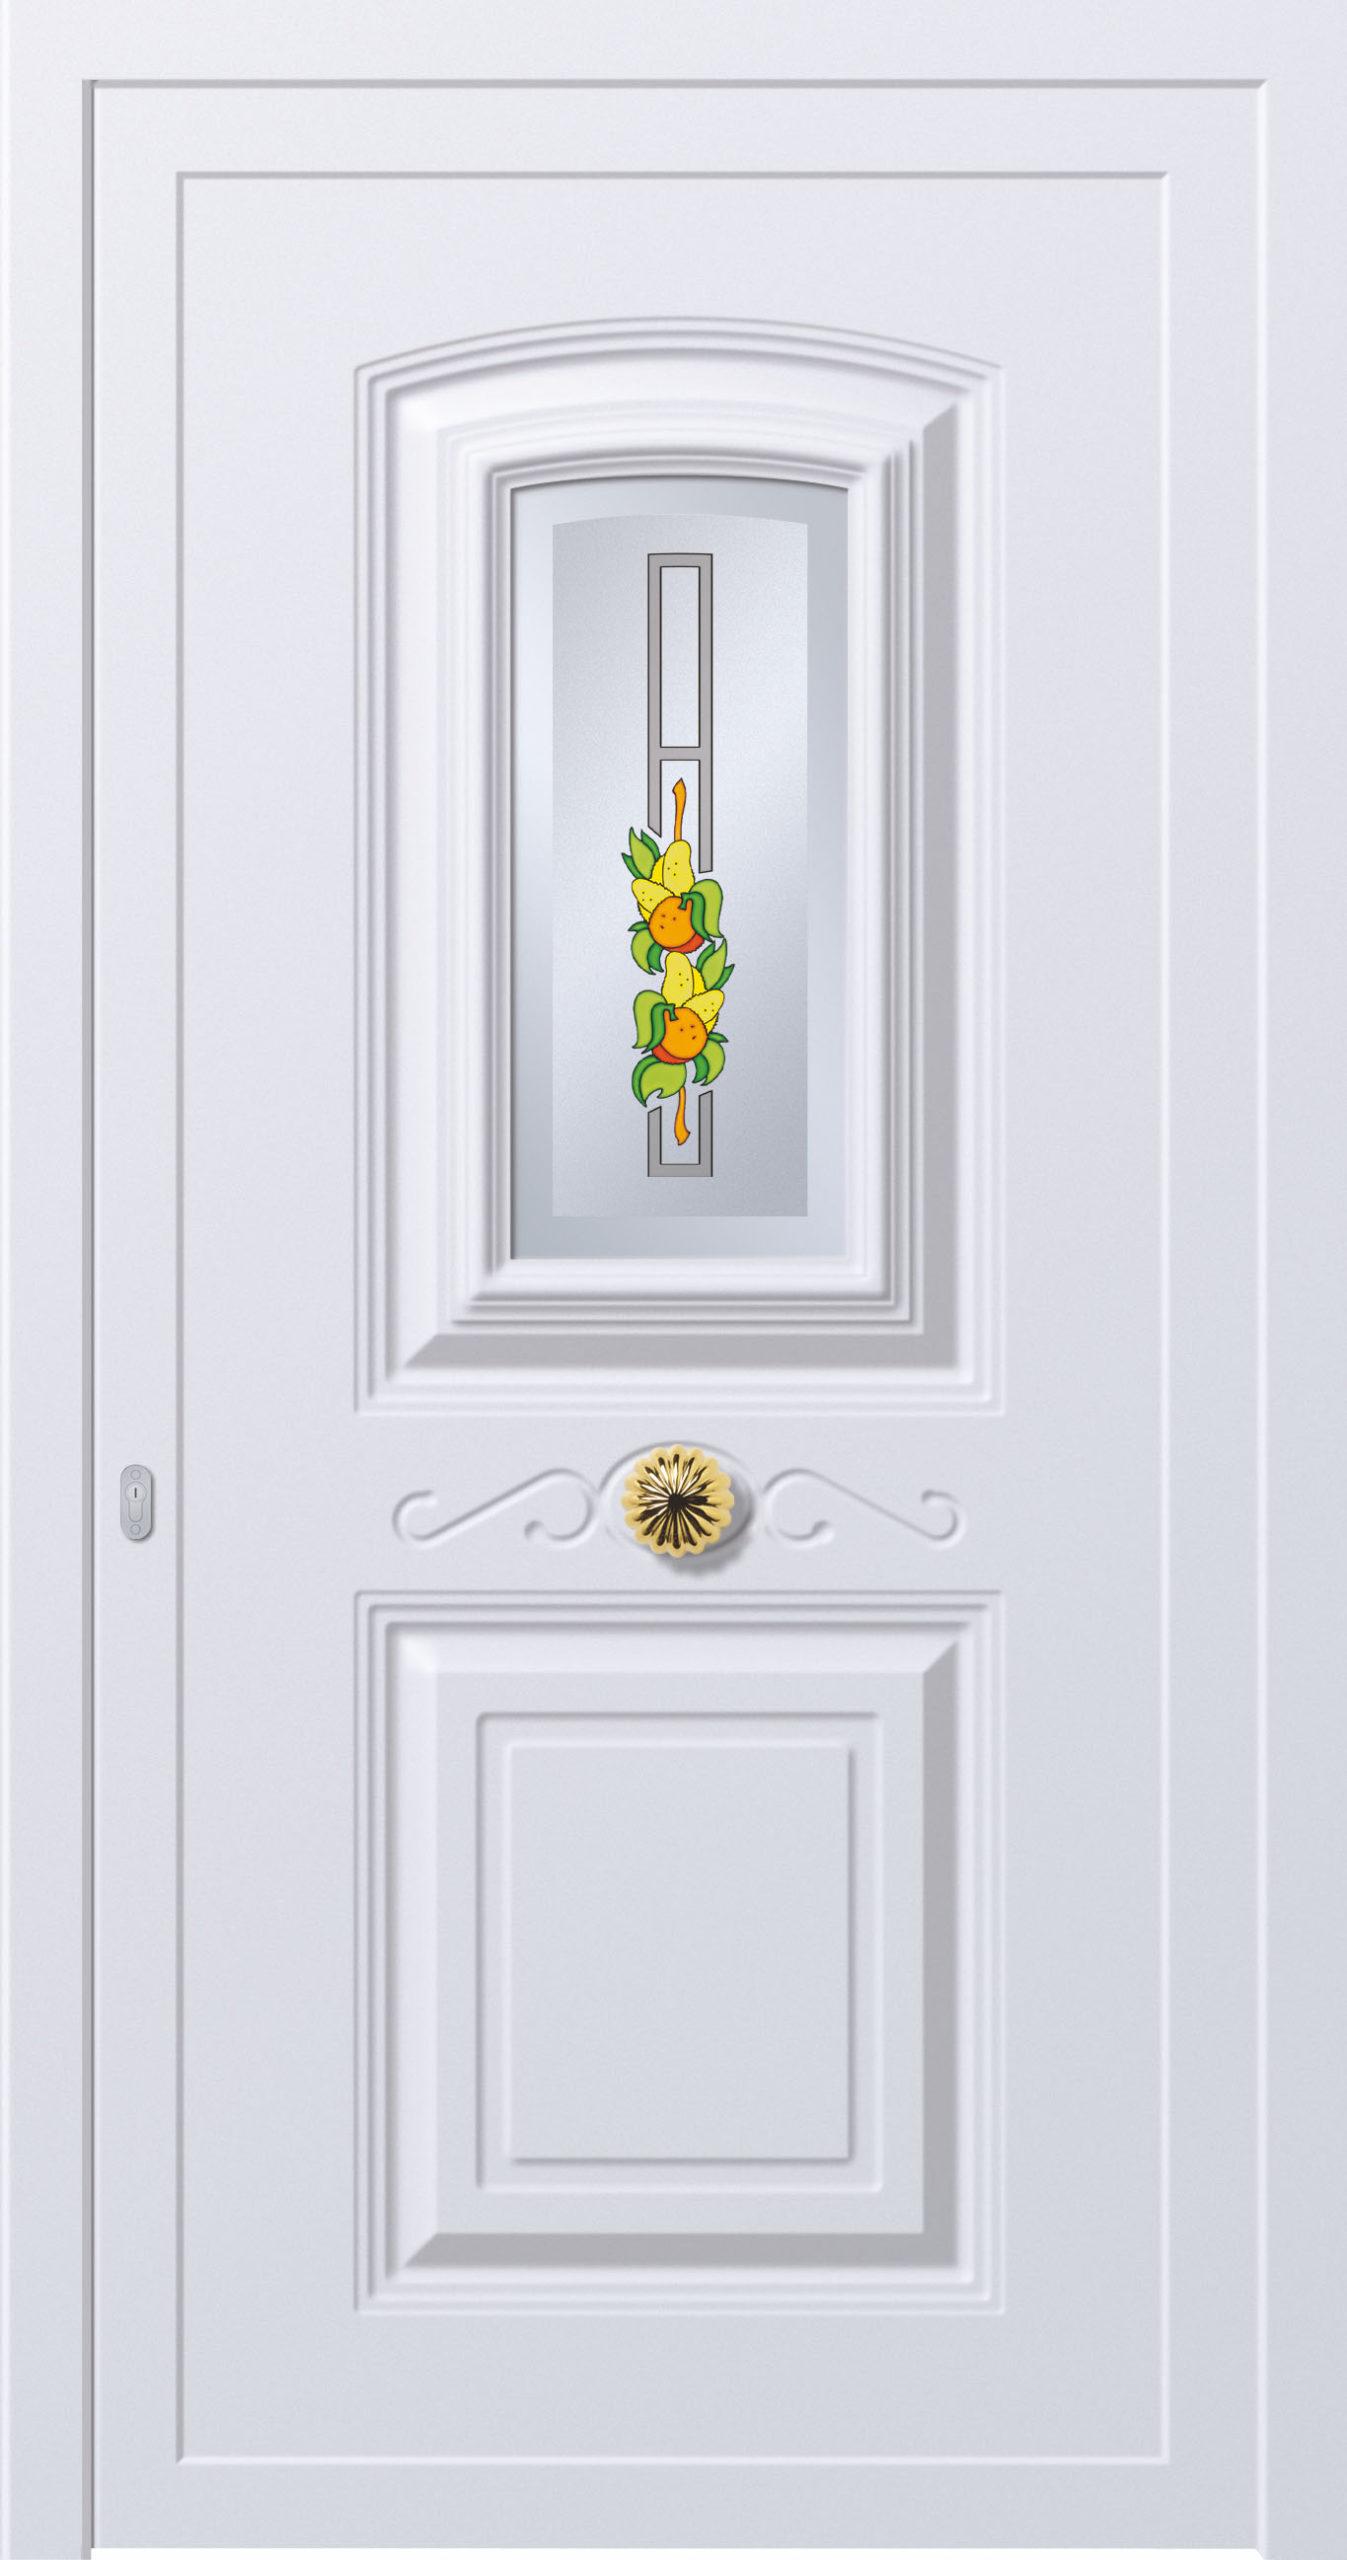 Entry Doors Linea Classica 49